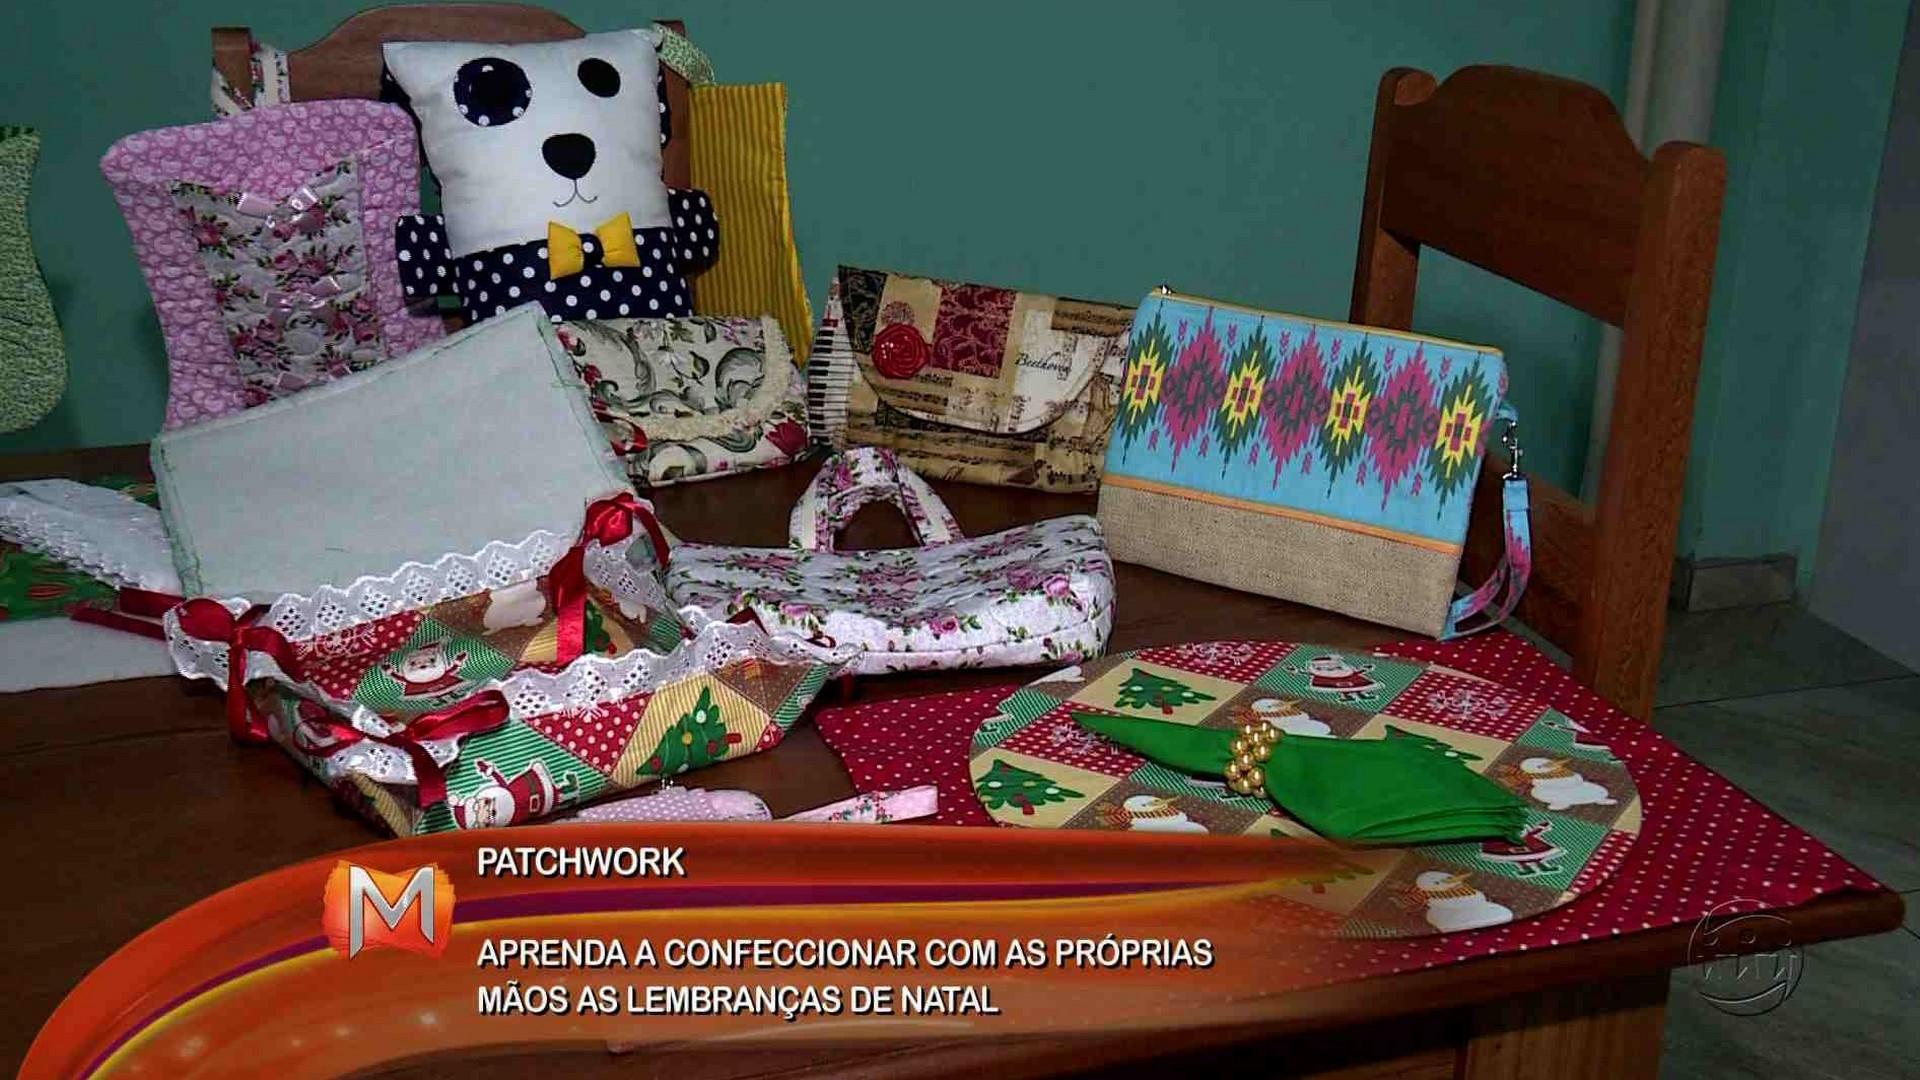 PATCHWORK: APRENDA A CONFECCIONAR PRESENTES DE NATAL - Magazine 13/12/17